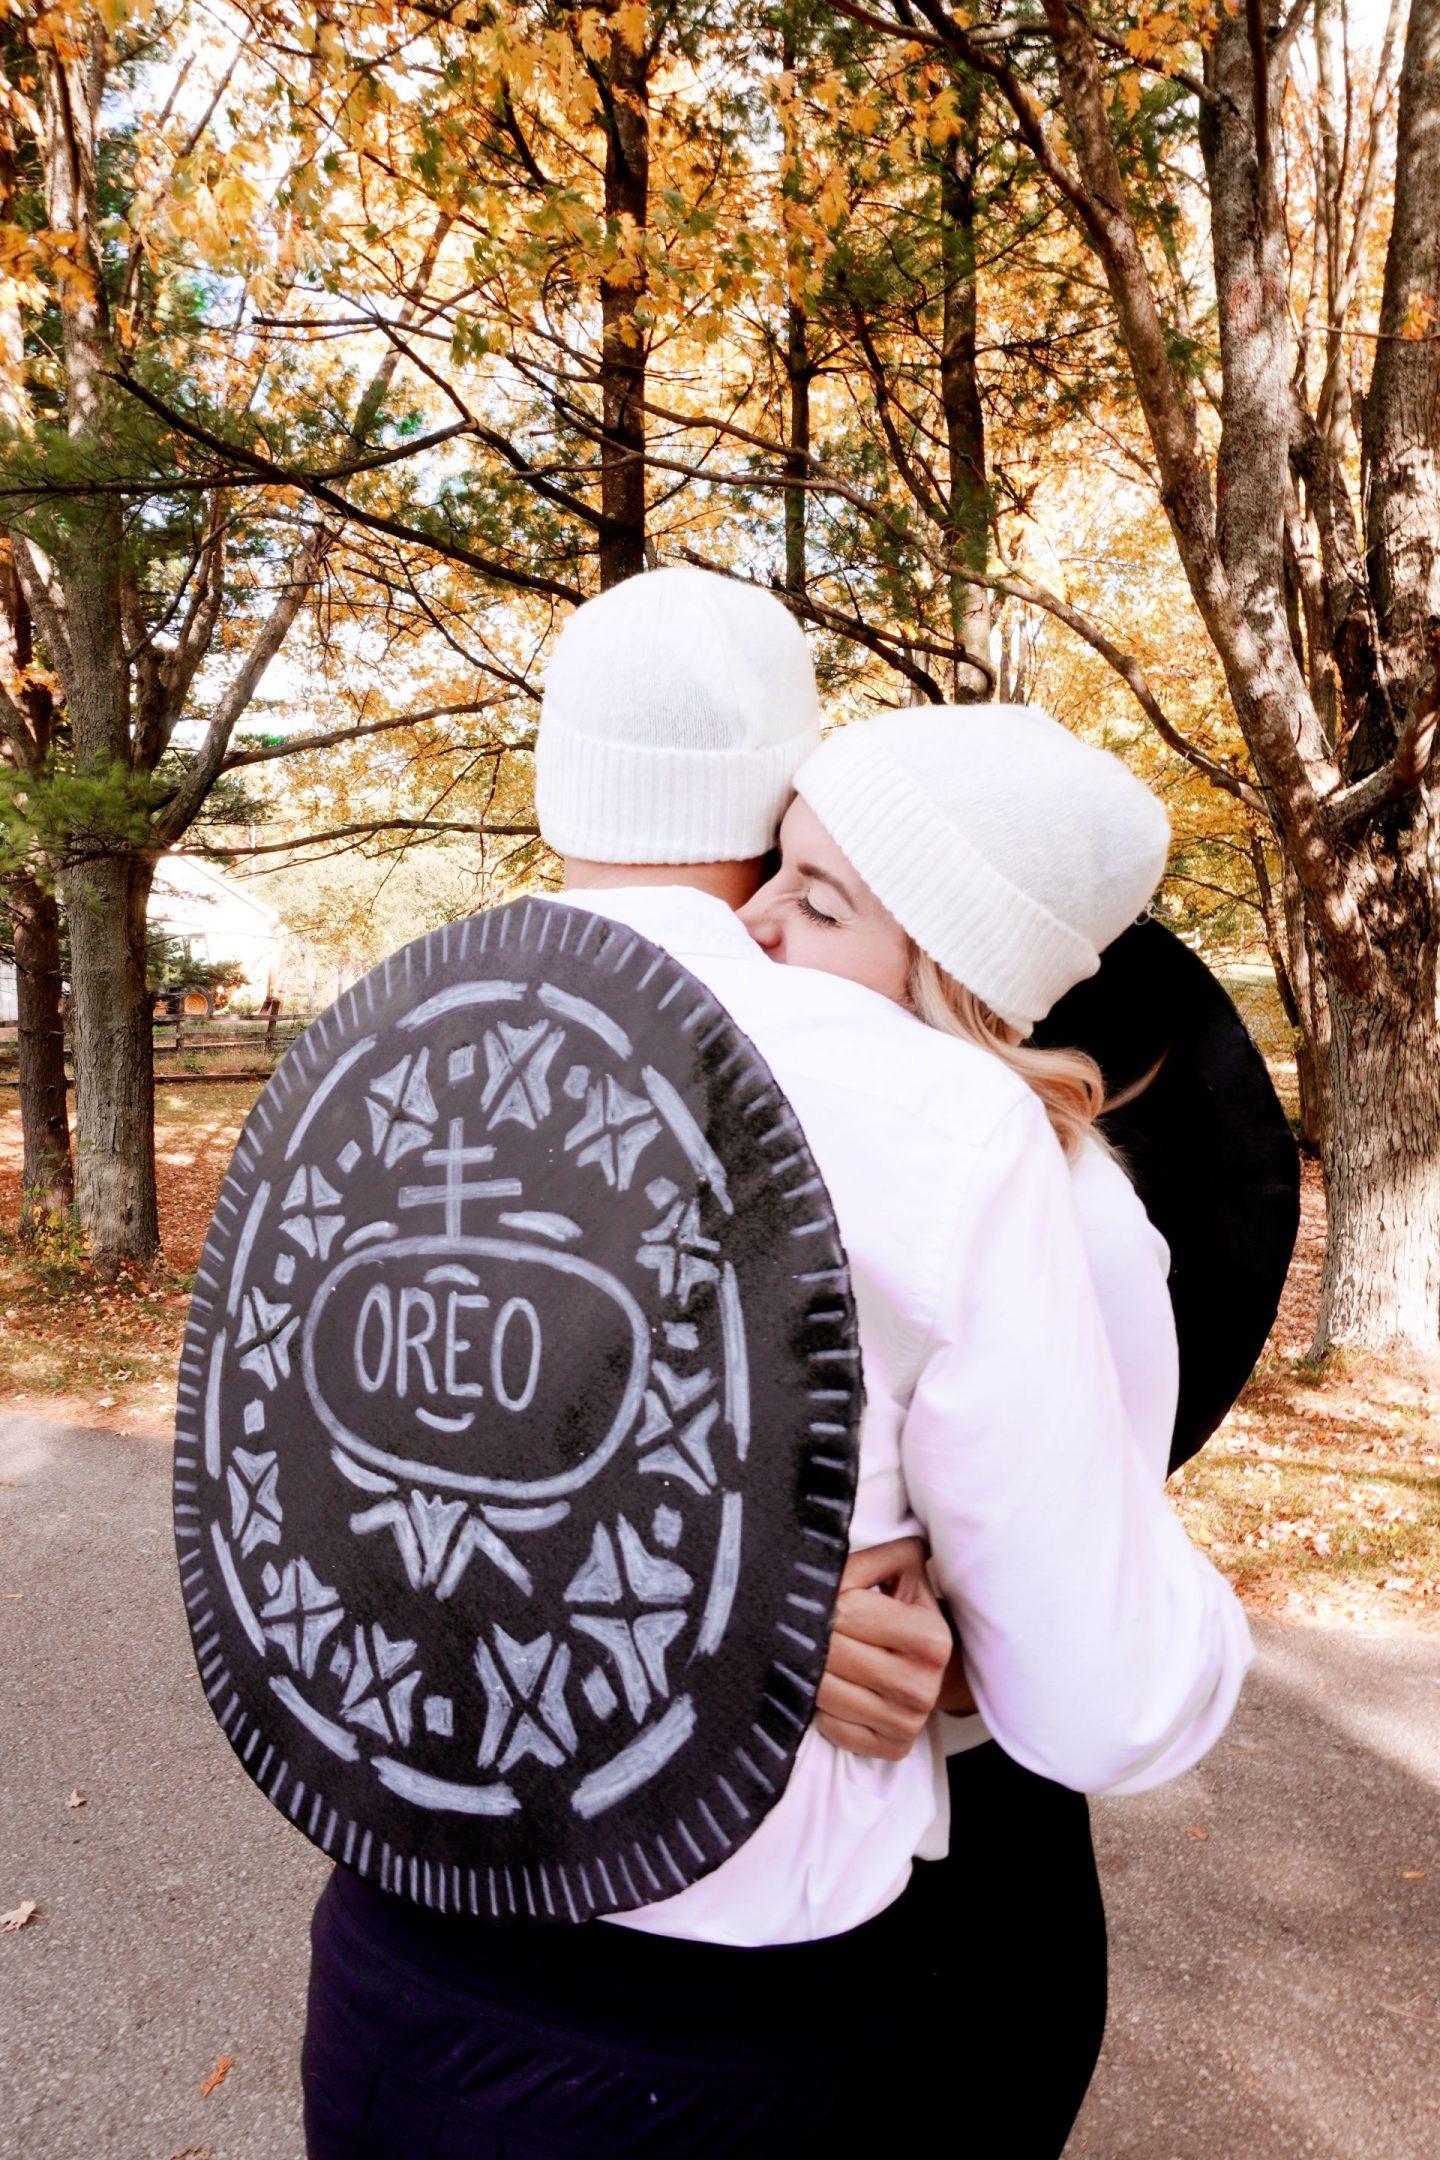 DIY halloween costume ideas for couples double stuffed OREO